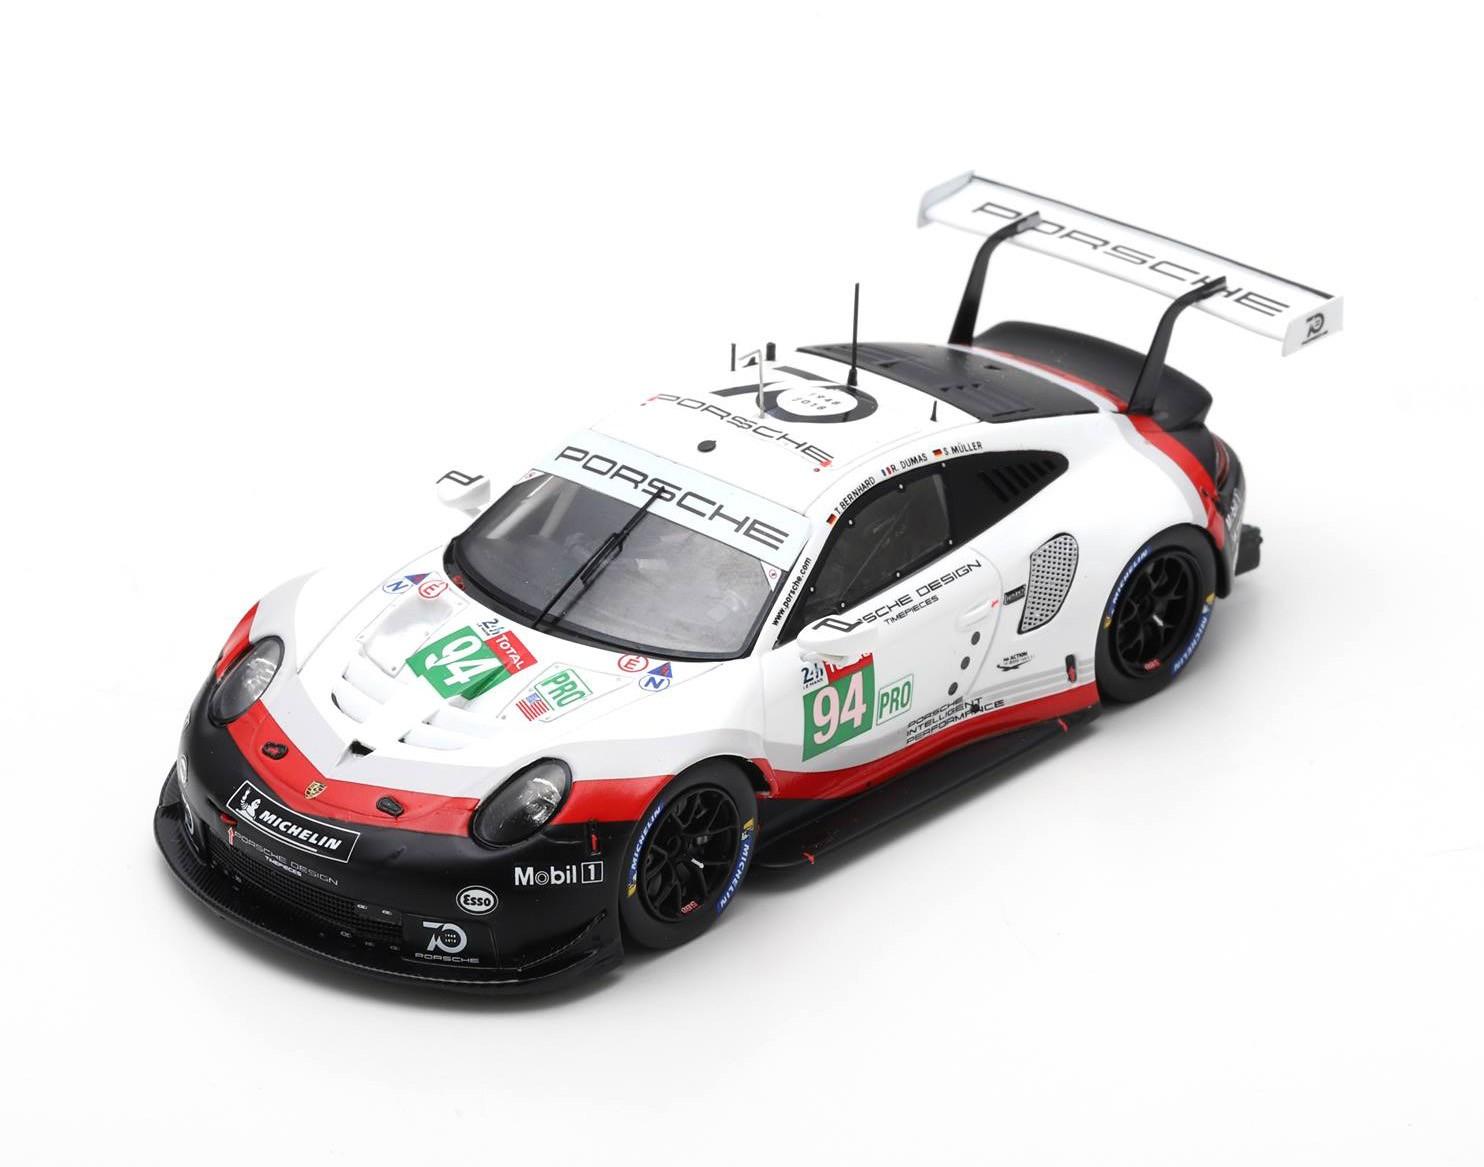 Porsche 911 RSR 94 24 Heures du Mans 2018 Spark S7035